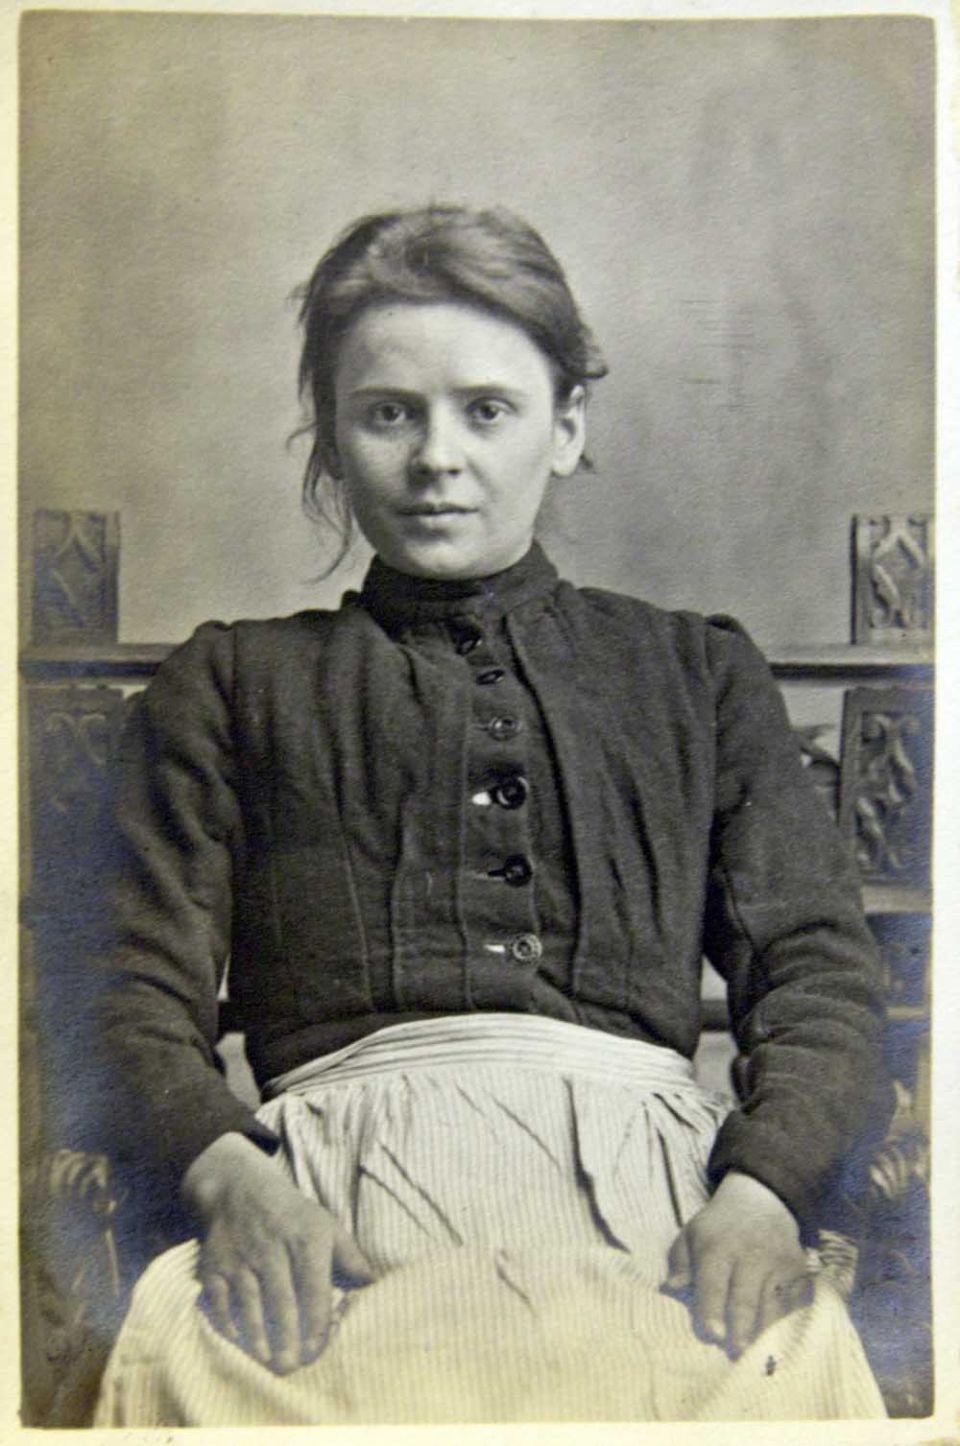 Menston Asylum. Mabel Grey, aged 27, buried Buckle Lane, row 20 grave 13